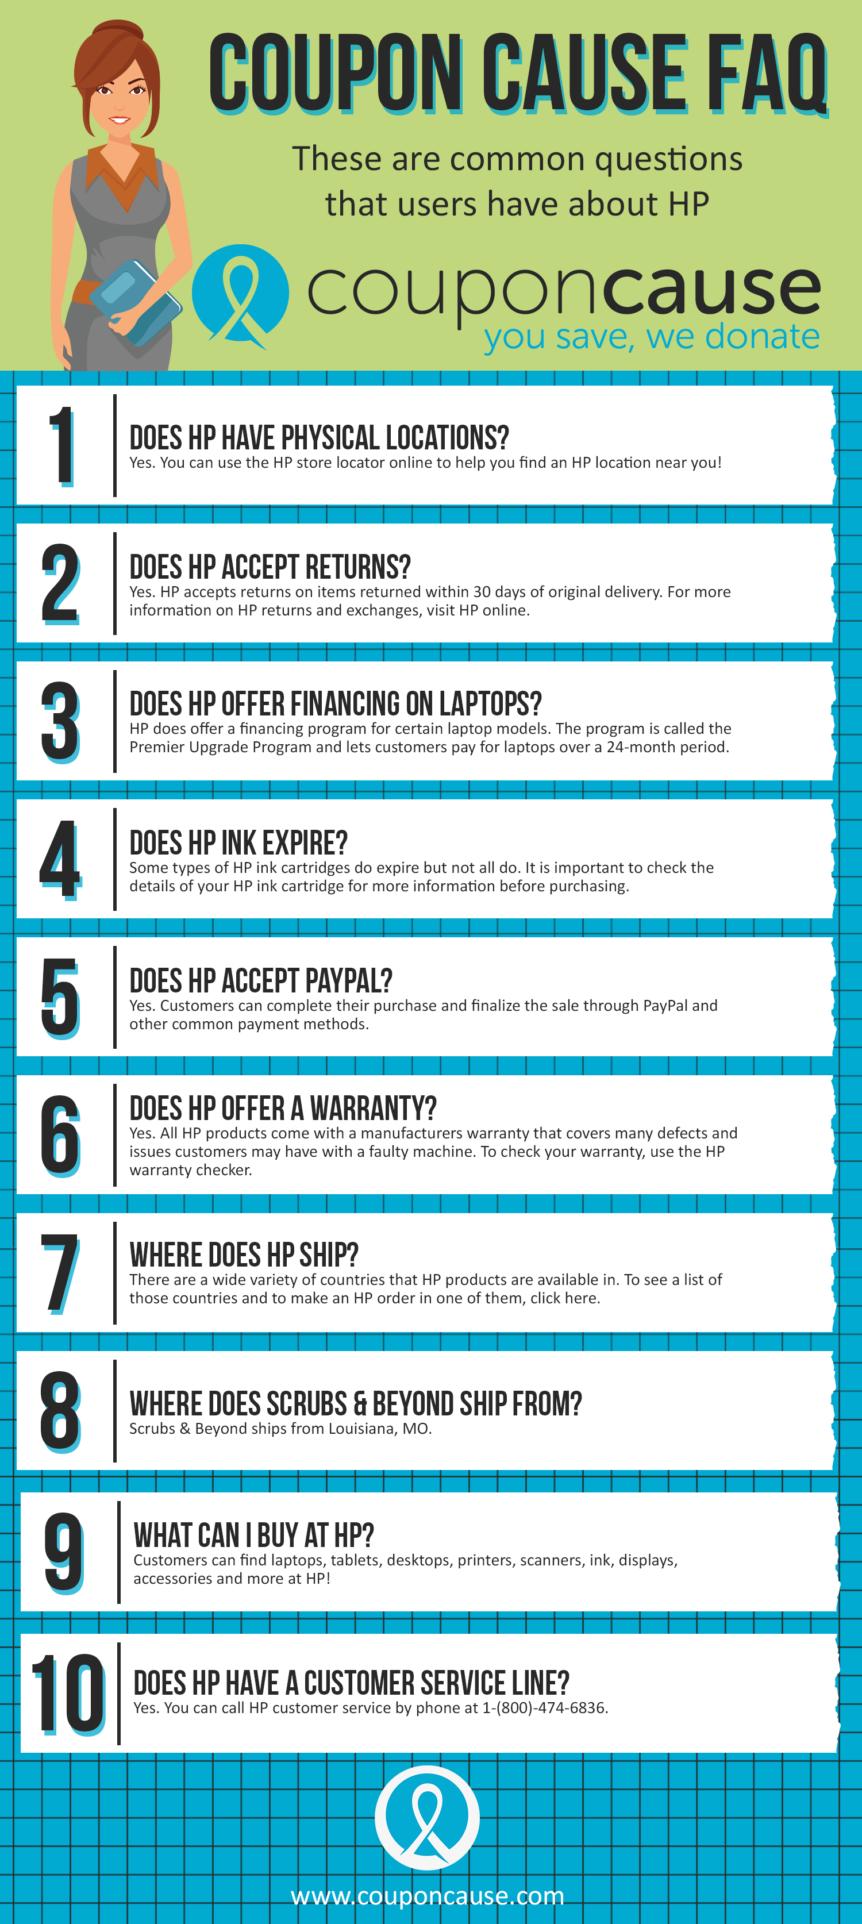 HP Coupon Cause FAQ (C.C. FAQ)